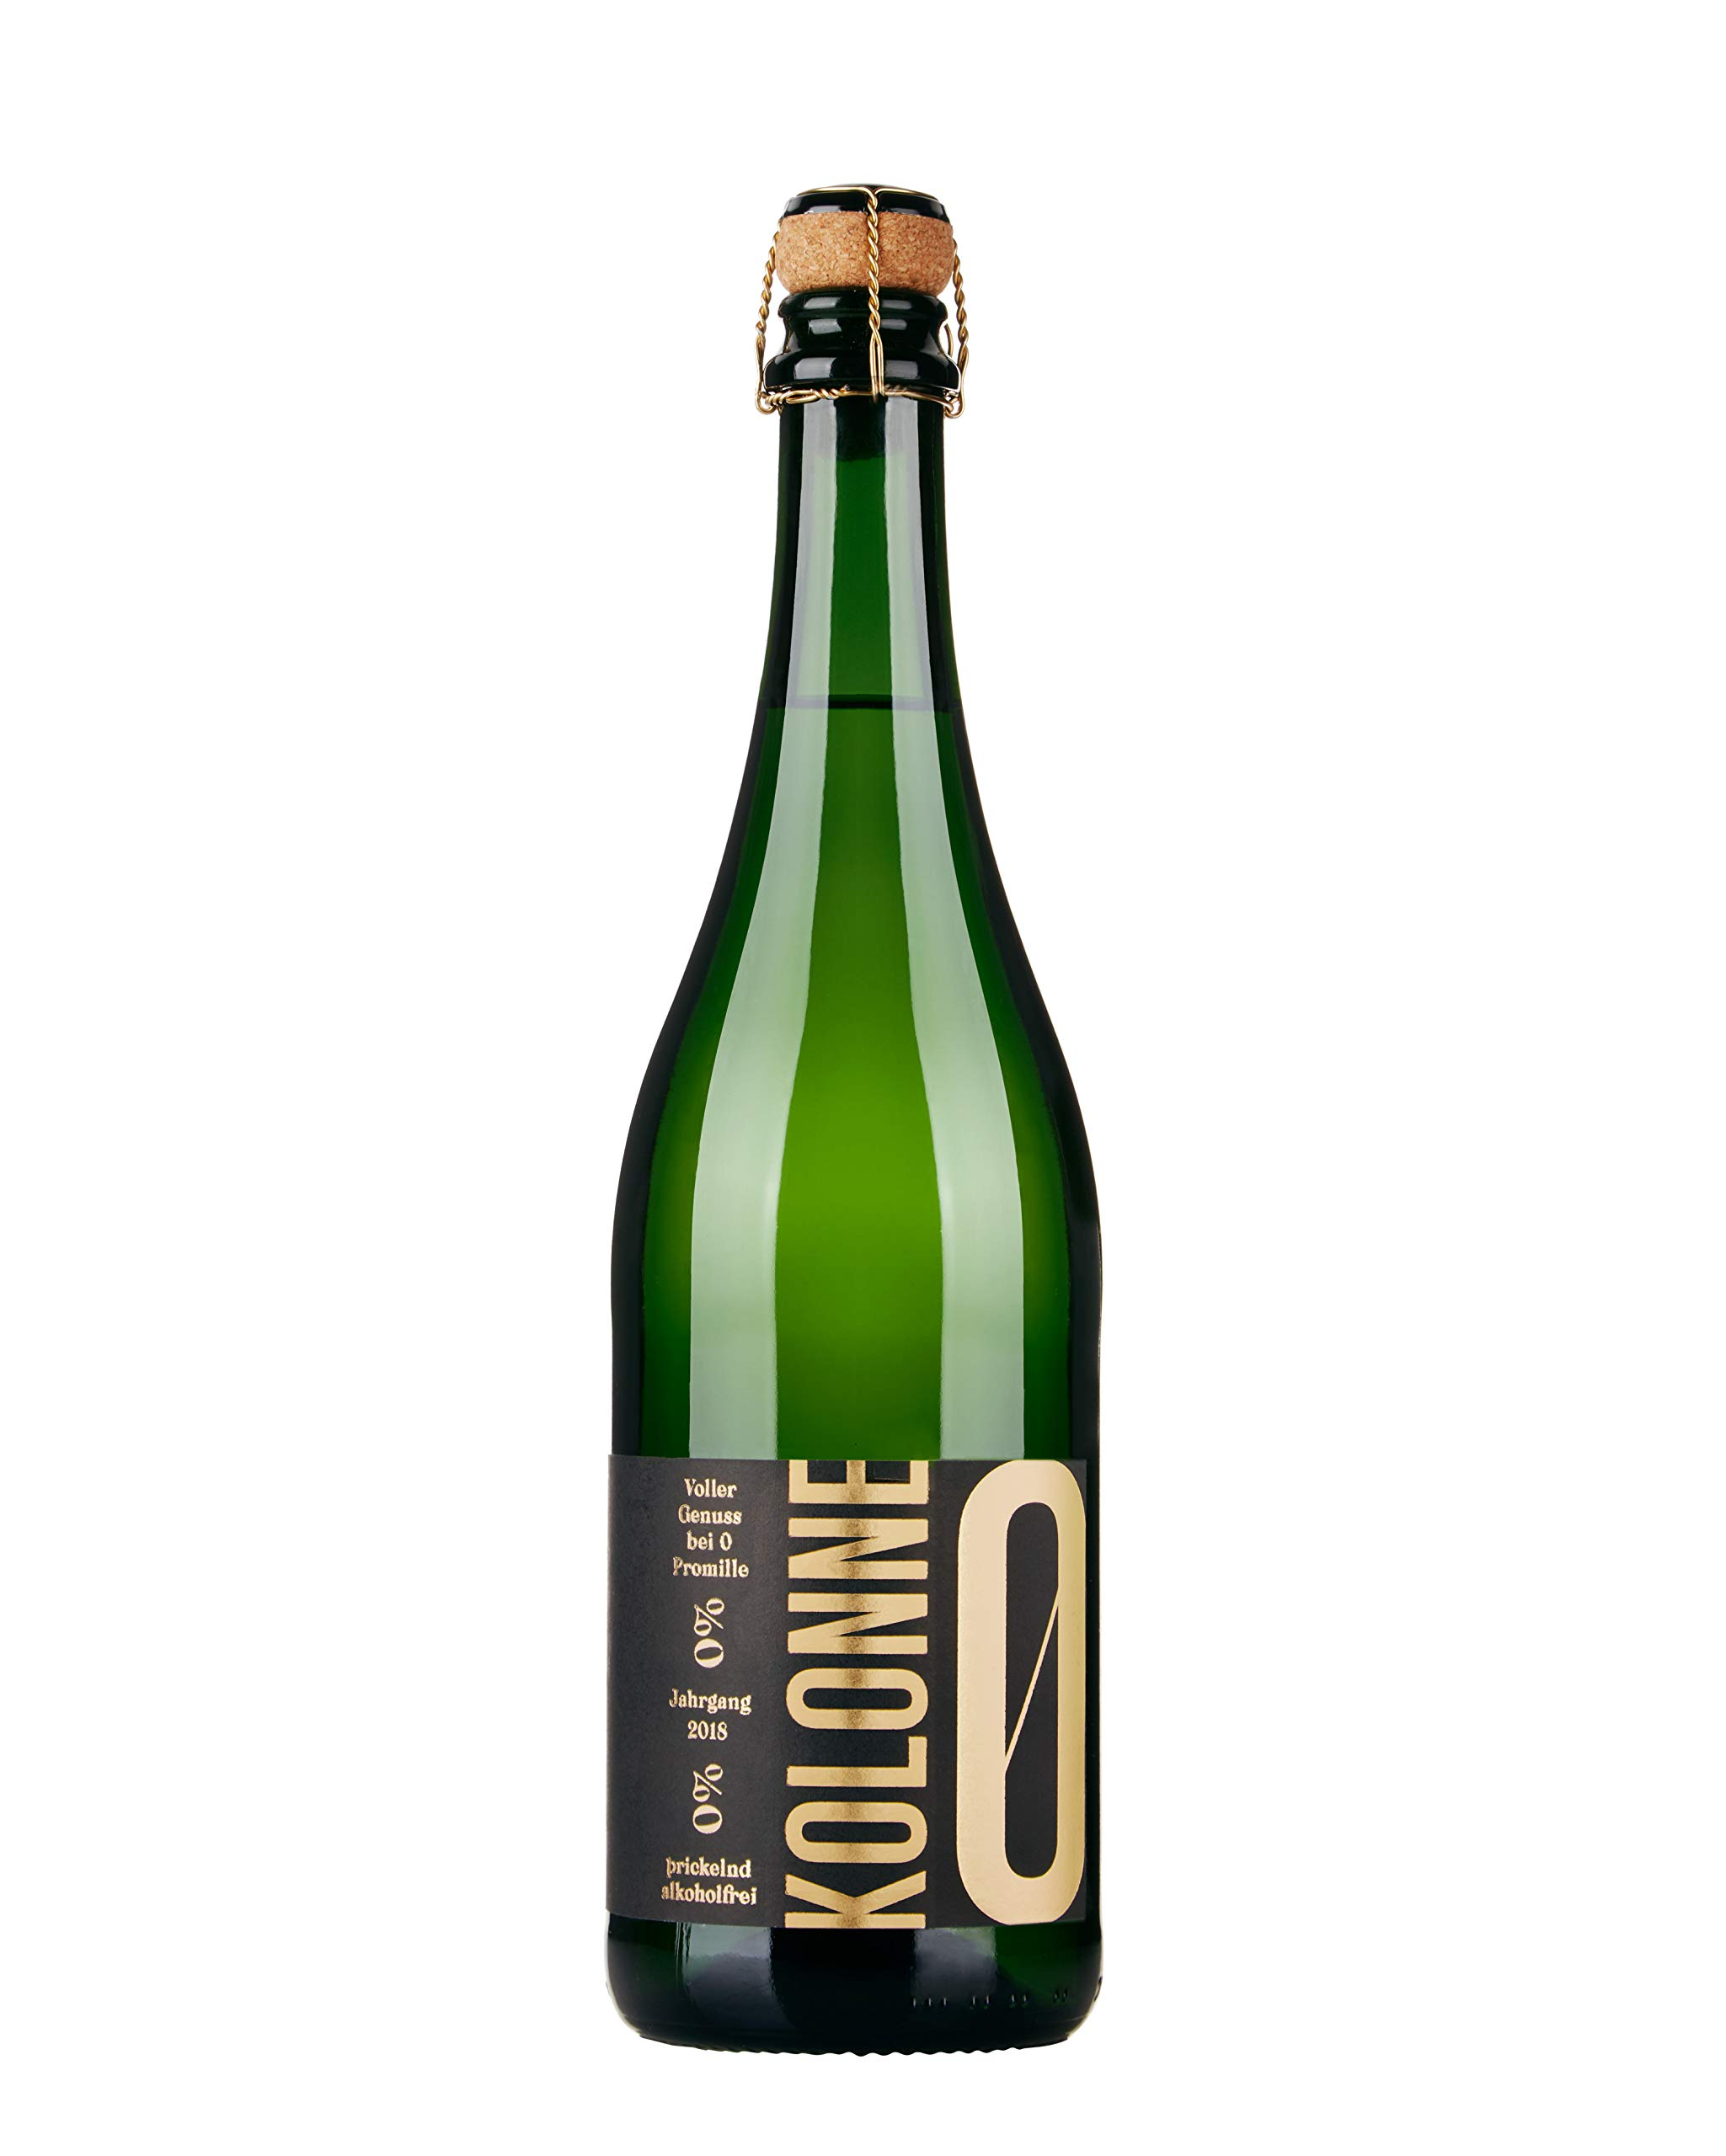 Kolonne-Null-Alkoholfreier-Sekt-1-x-075-L-Riesling-Jahrgang-2018